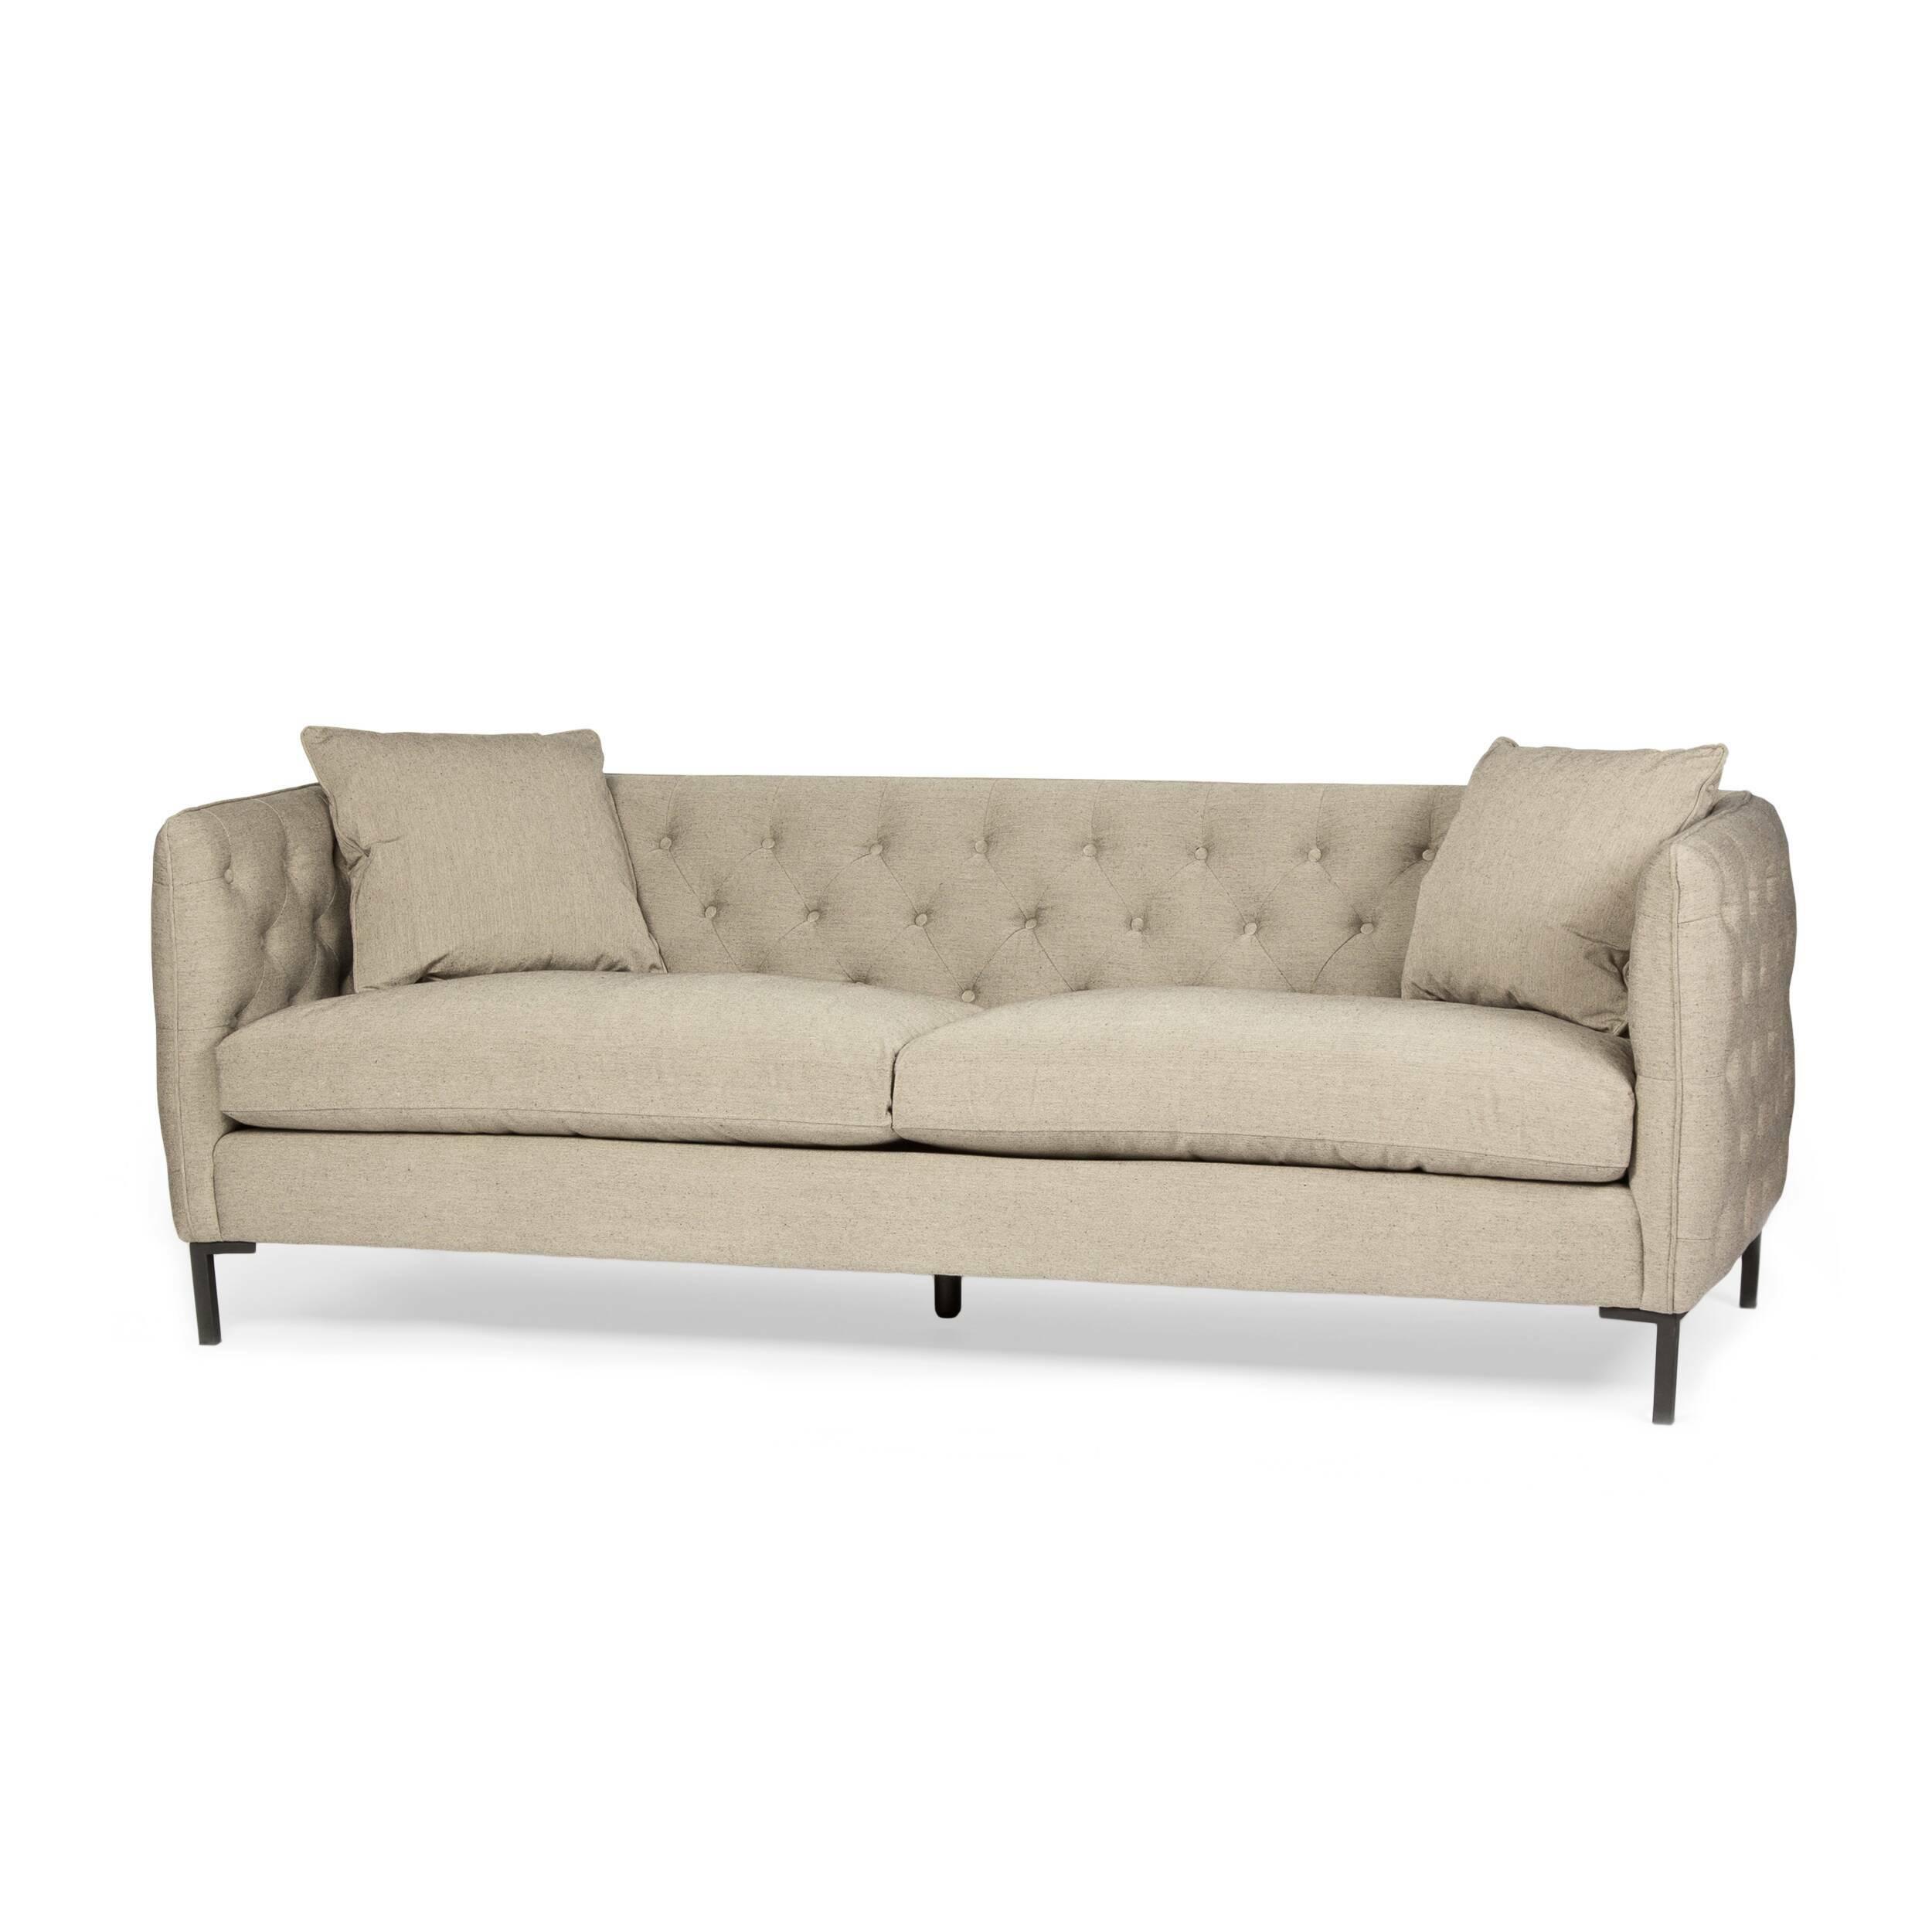 Диван FS060-30 Rev#1 Masen Sofa